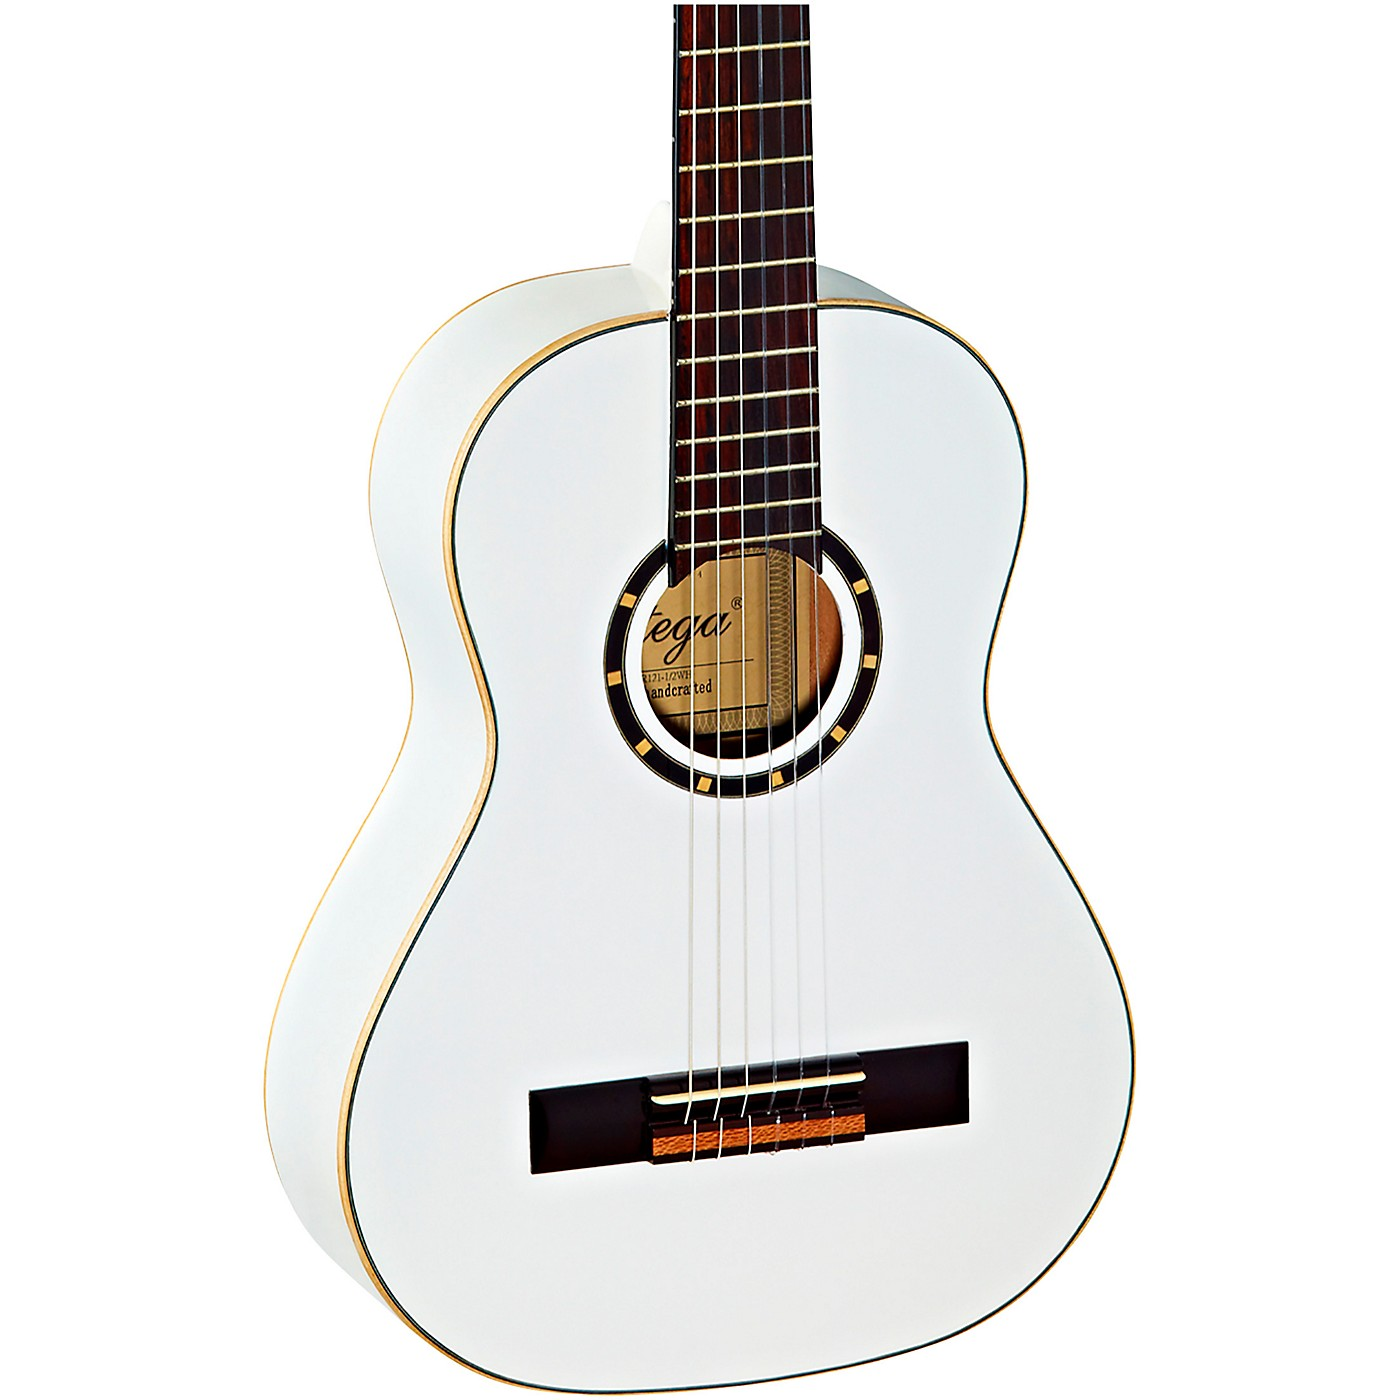 Ortega R121 Family Series 1/2 Size Classical Guitar thumbnail